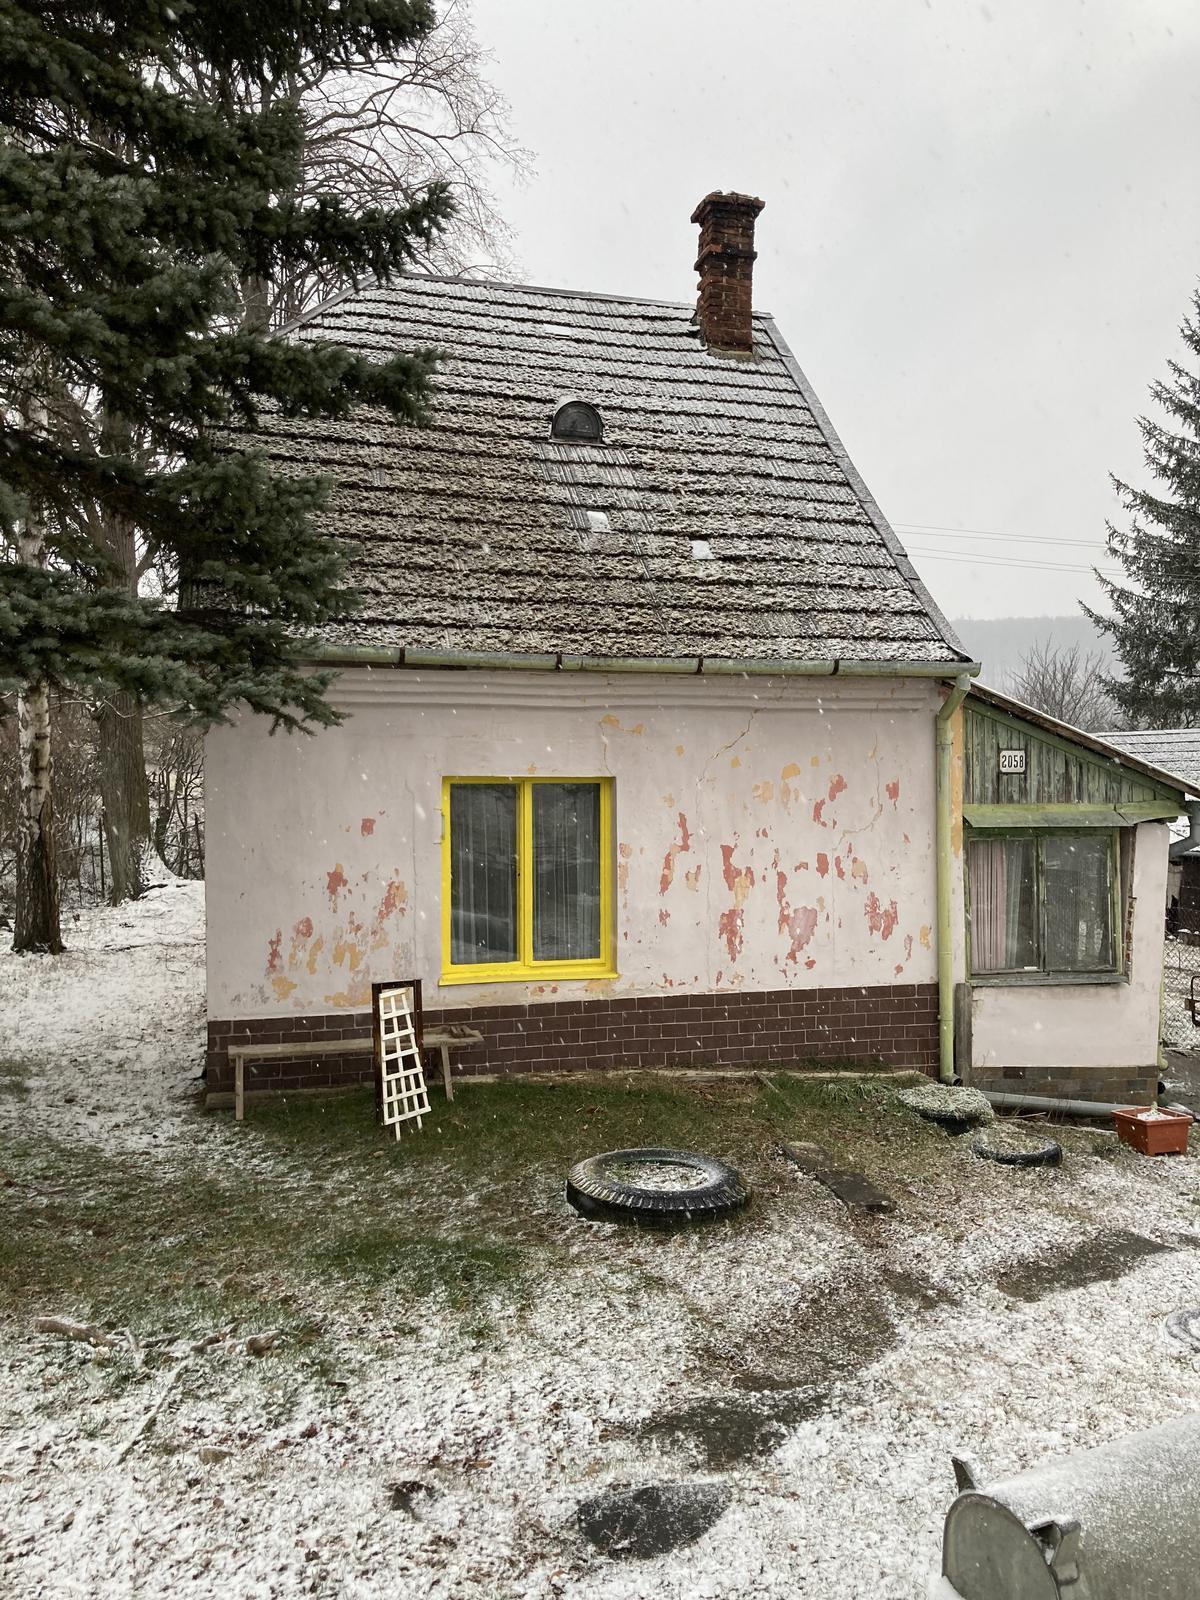 Dom - Obrázok č. 159